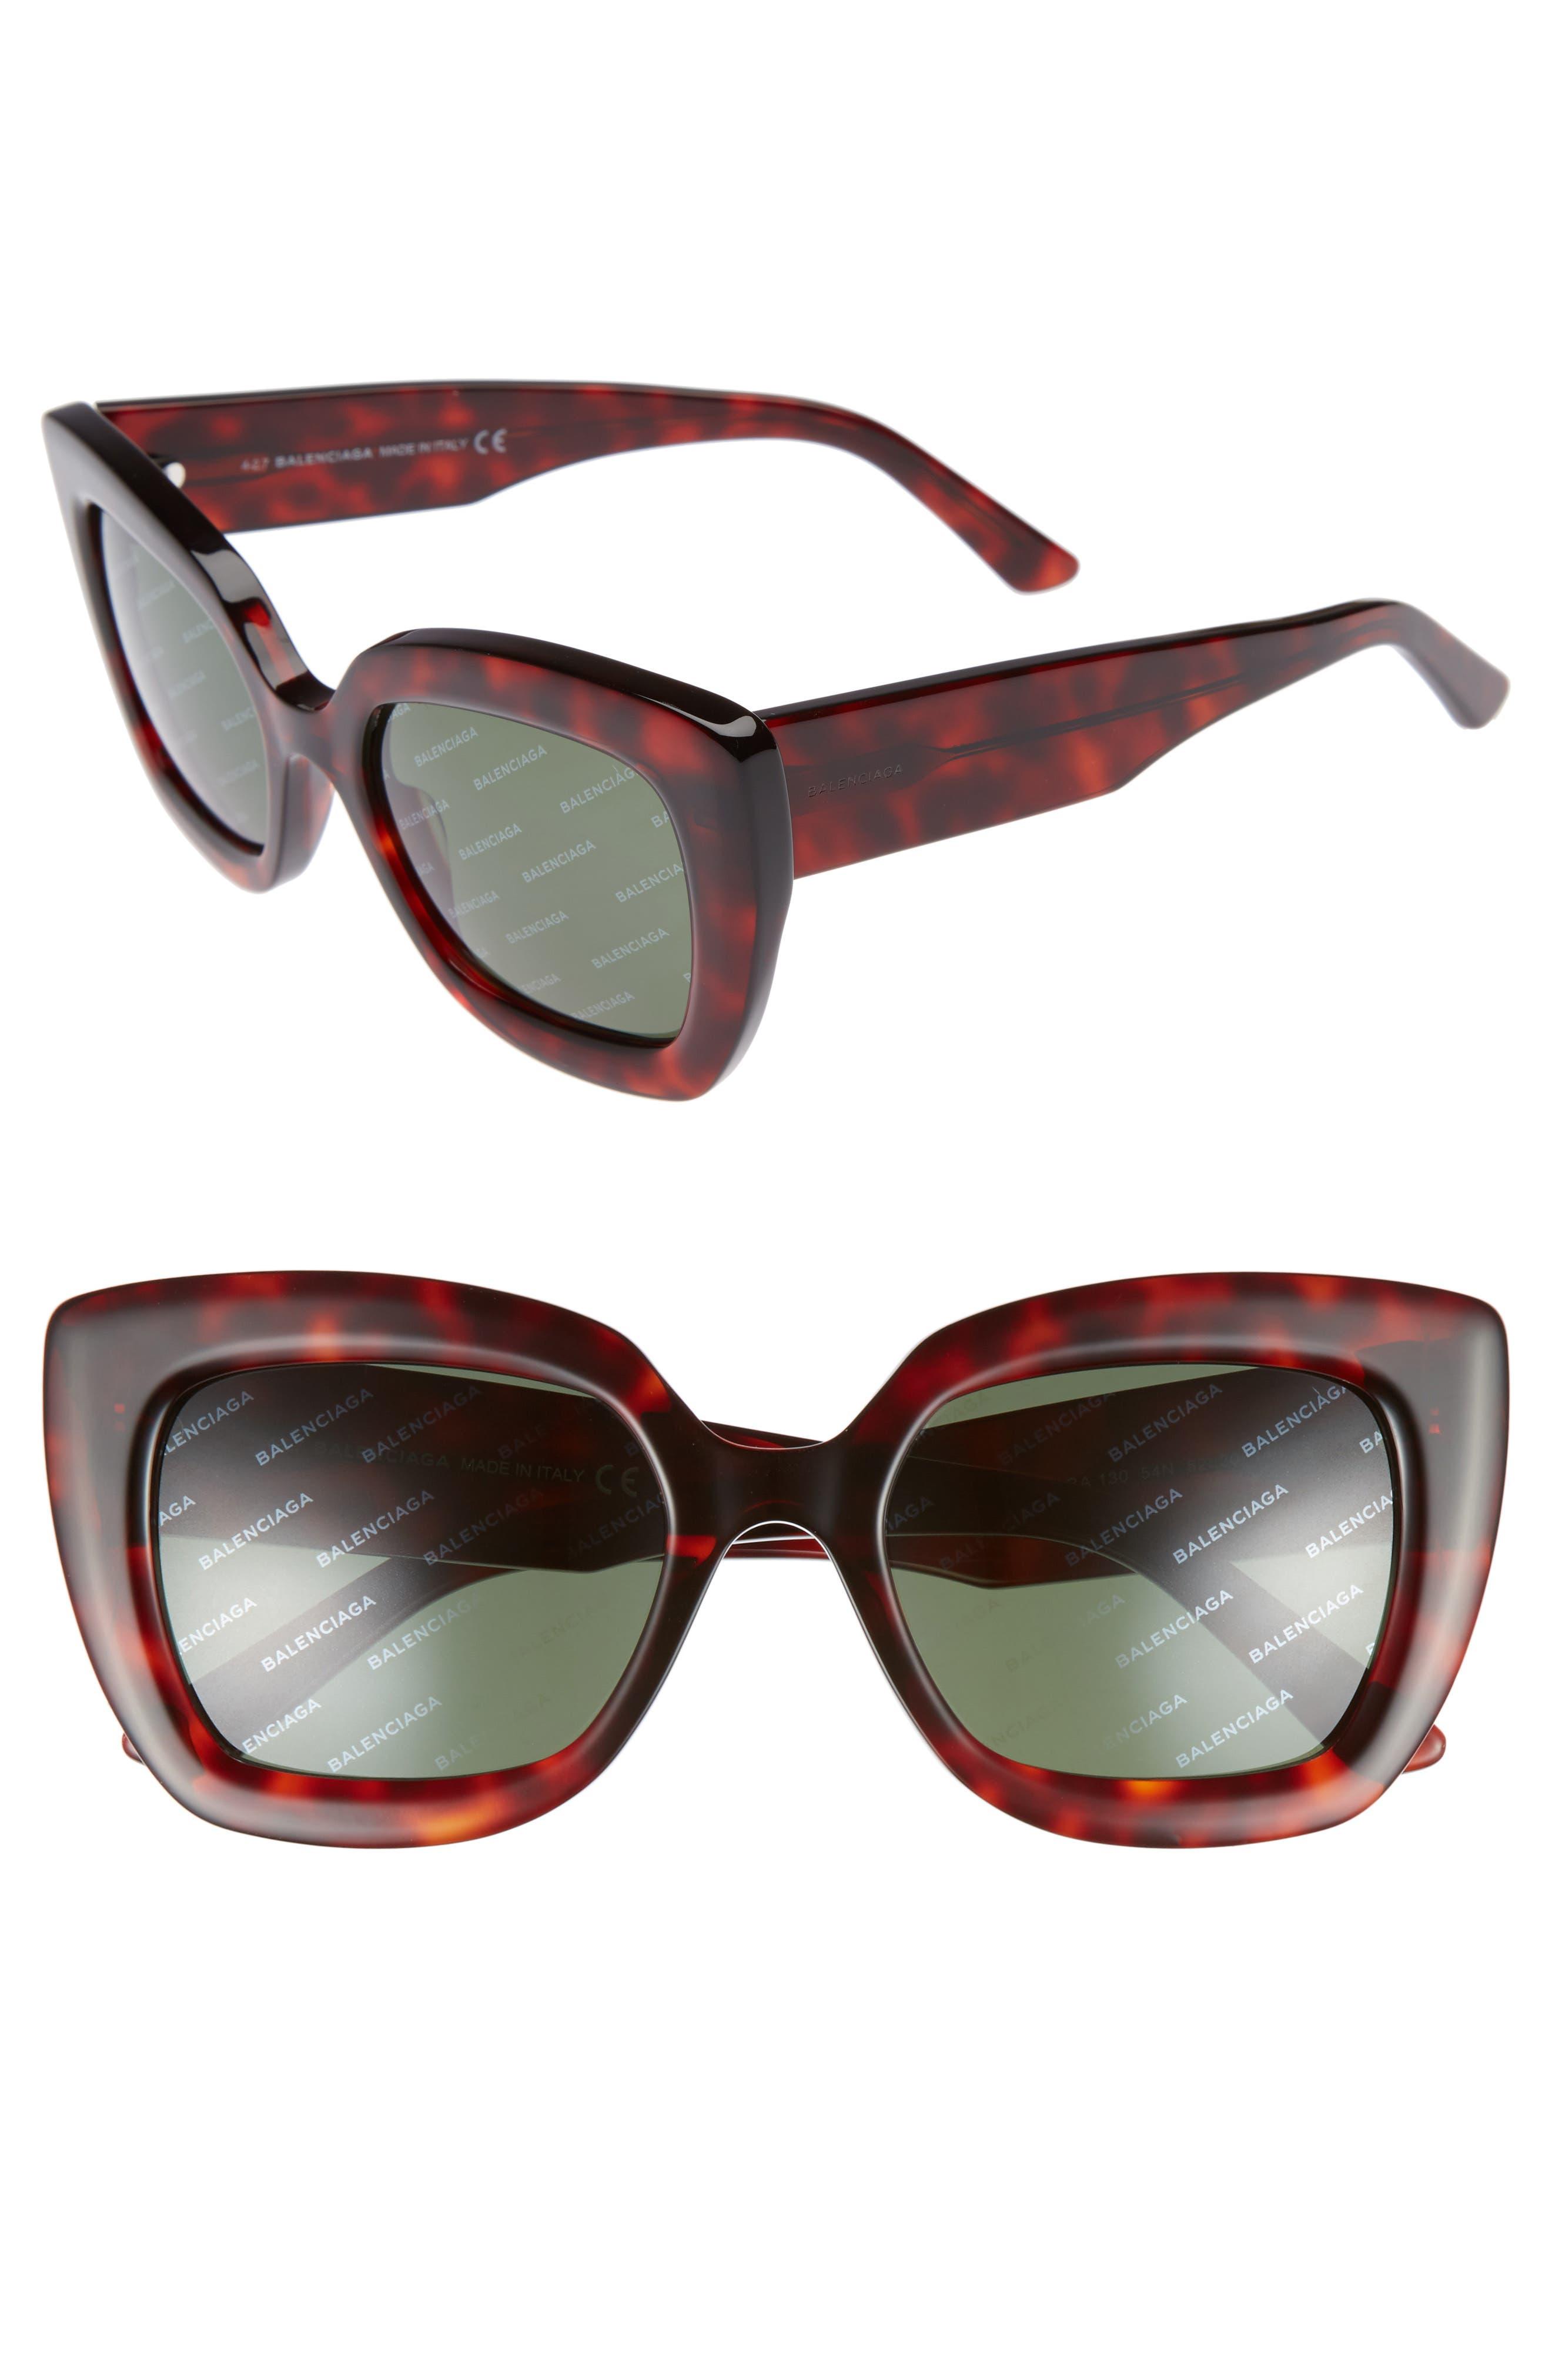 52mm Cat Eye Sunglasses,                         Main,                         color, RED HAVANA/ GREEN